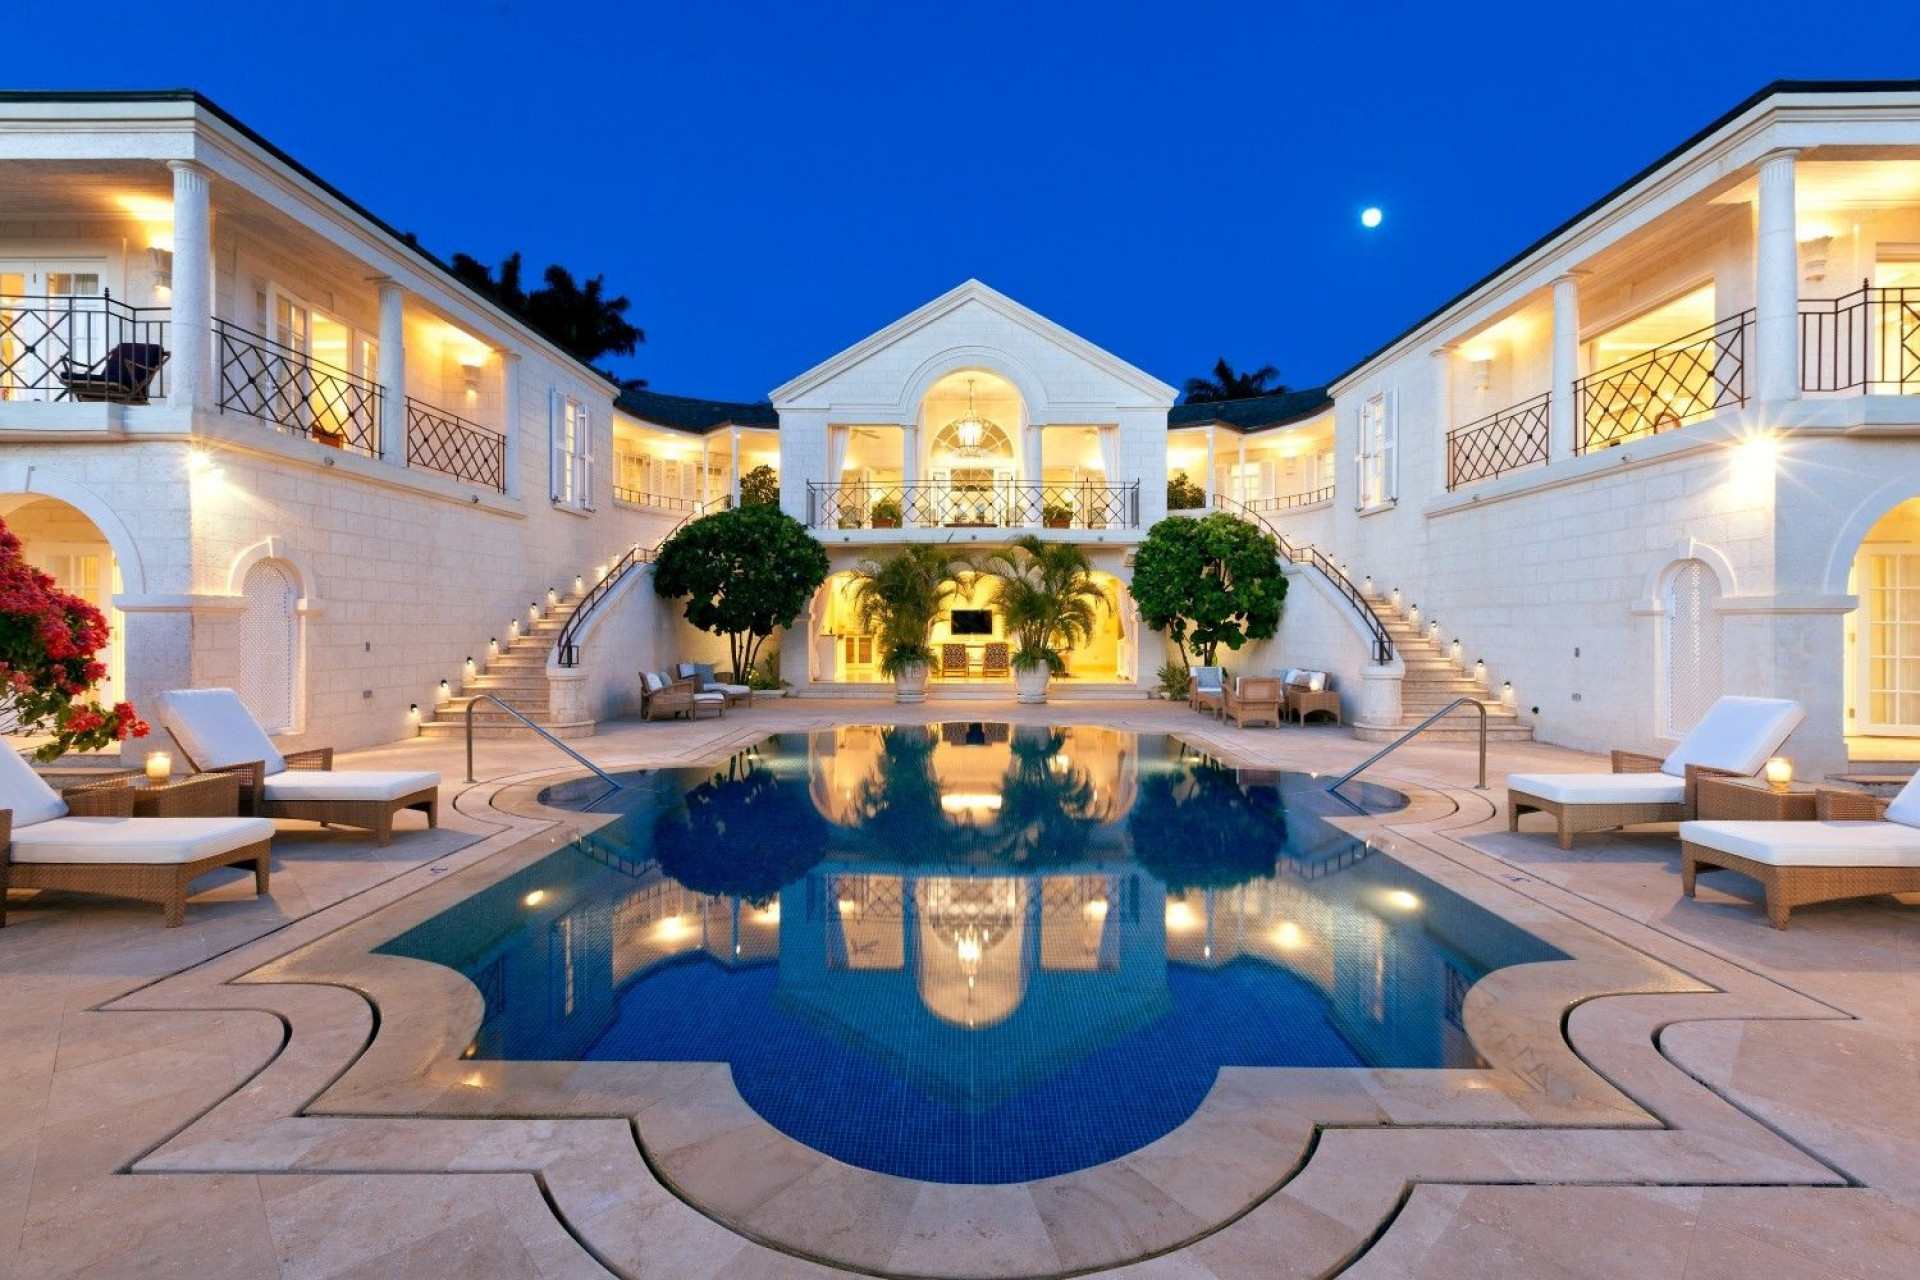 Dynasty TV Show Villa Gated 5 Bedroom Villa Sugar Hill, Barbados with Private Pool, Putting Green & Sea Views